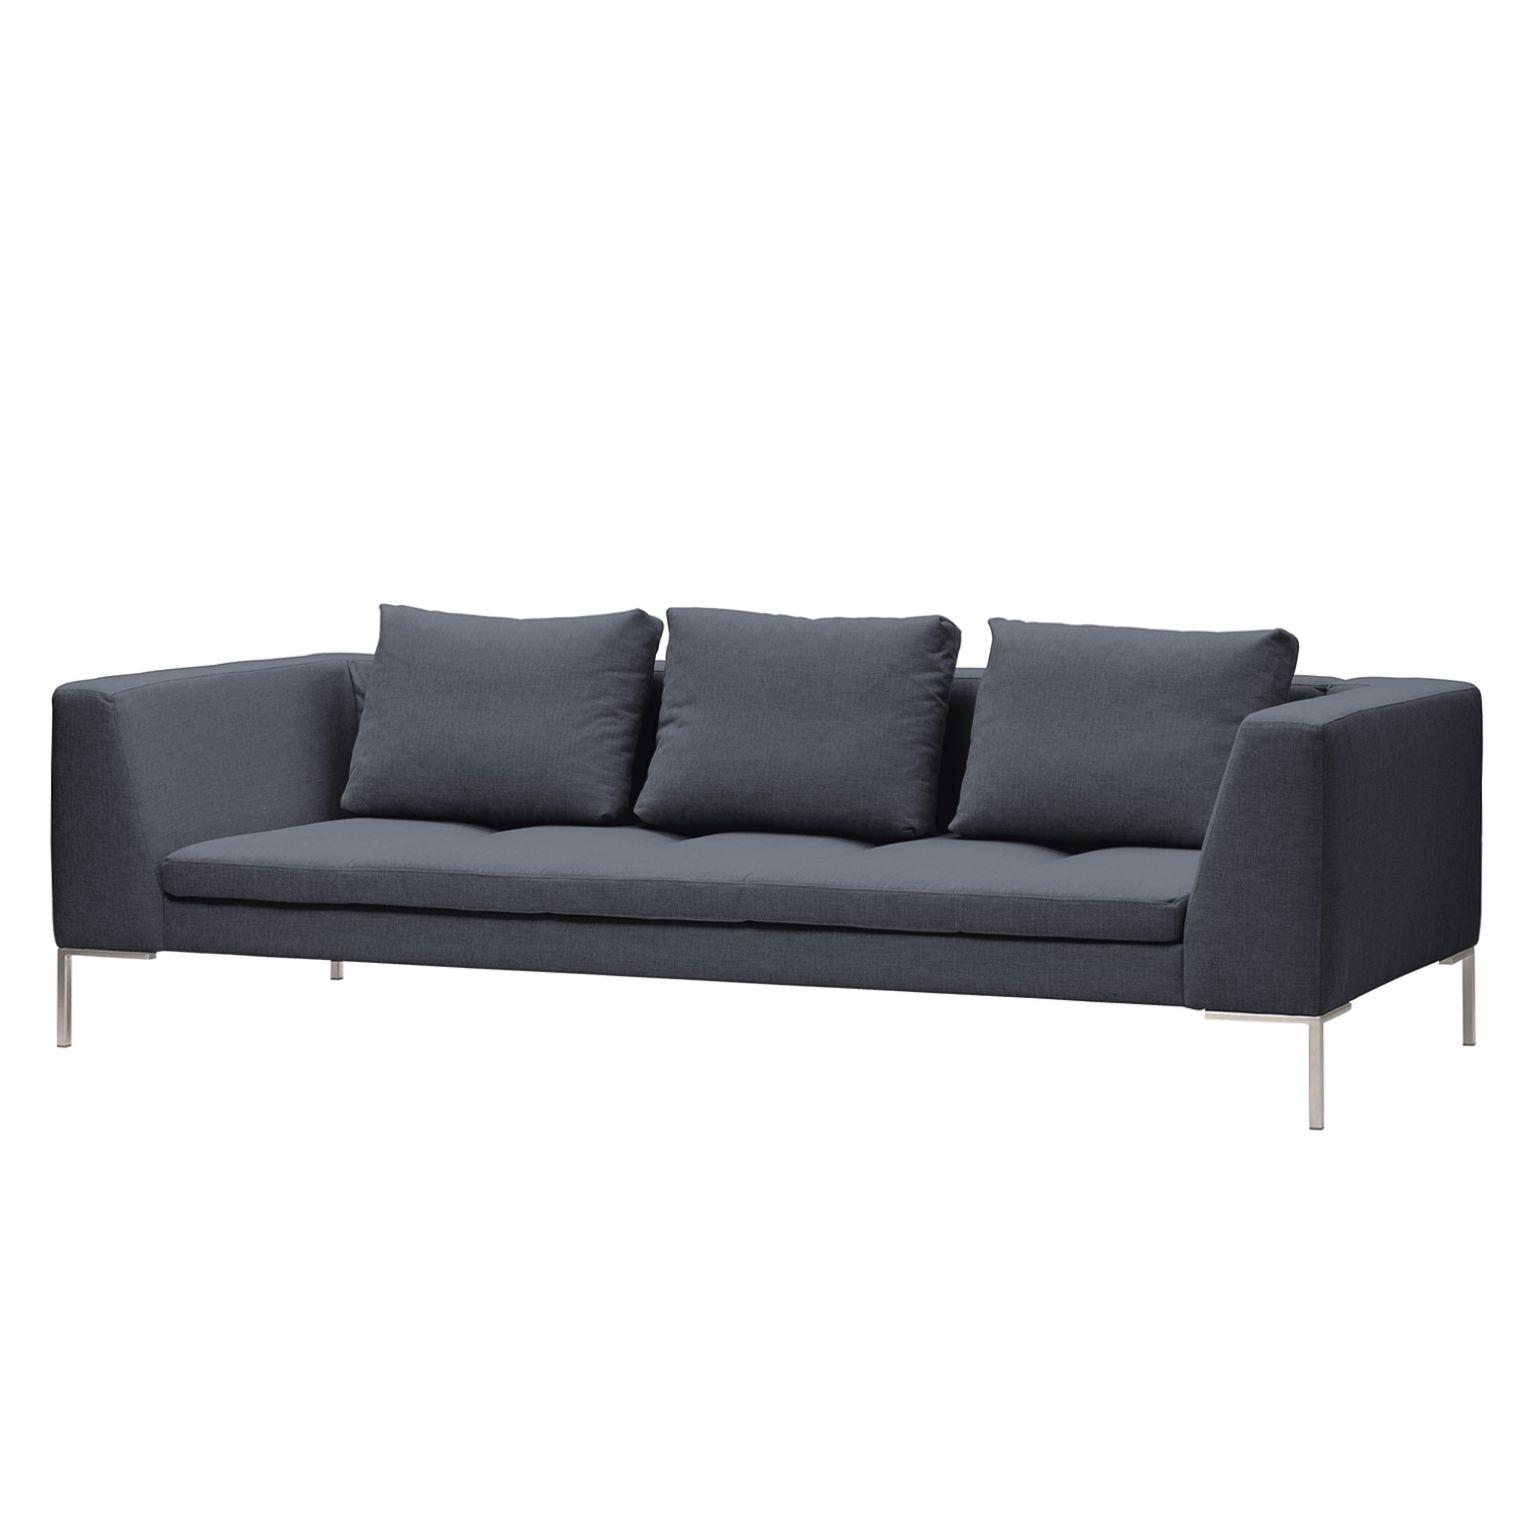 Sofa Madison 3 Sitzer Webstoff Sofas 3 Sitzer Sofa Sofa Billig